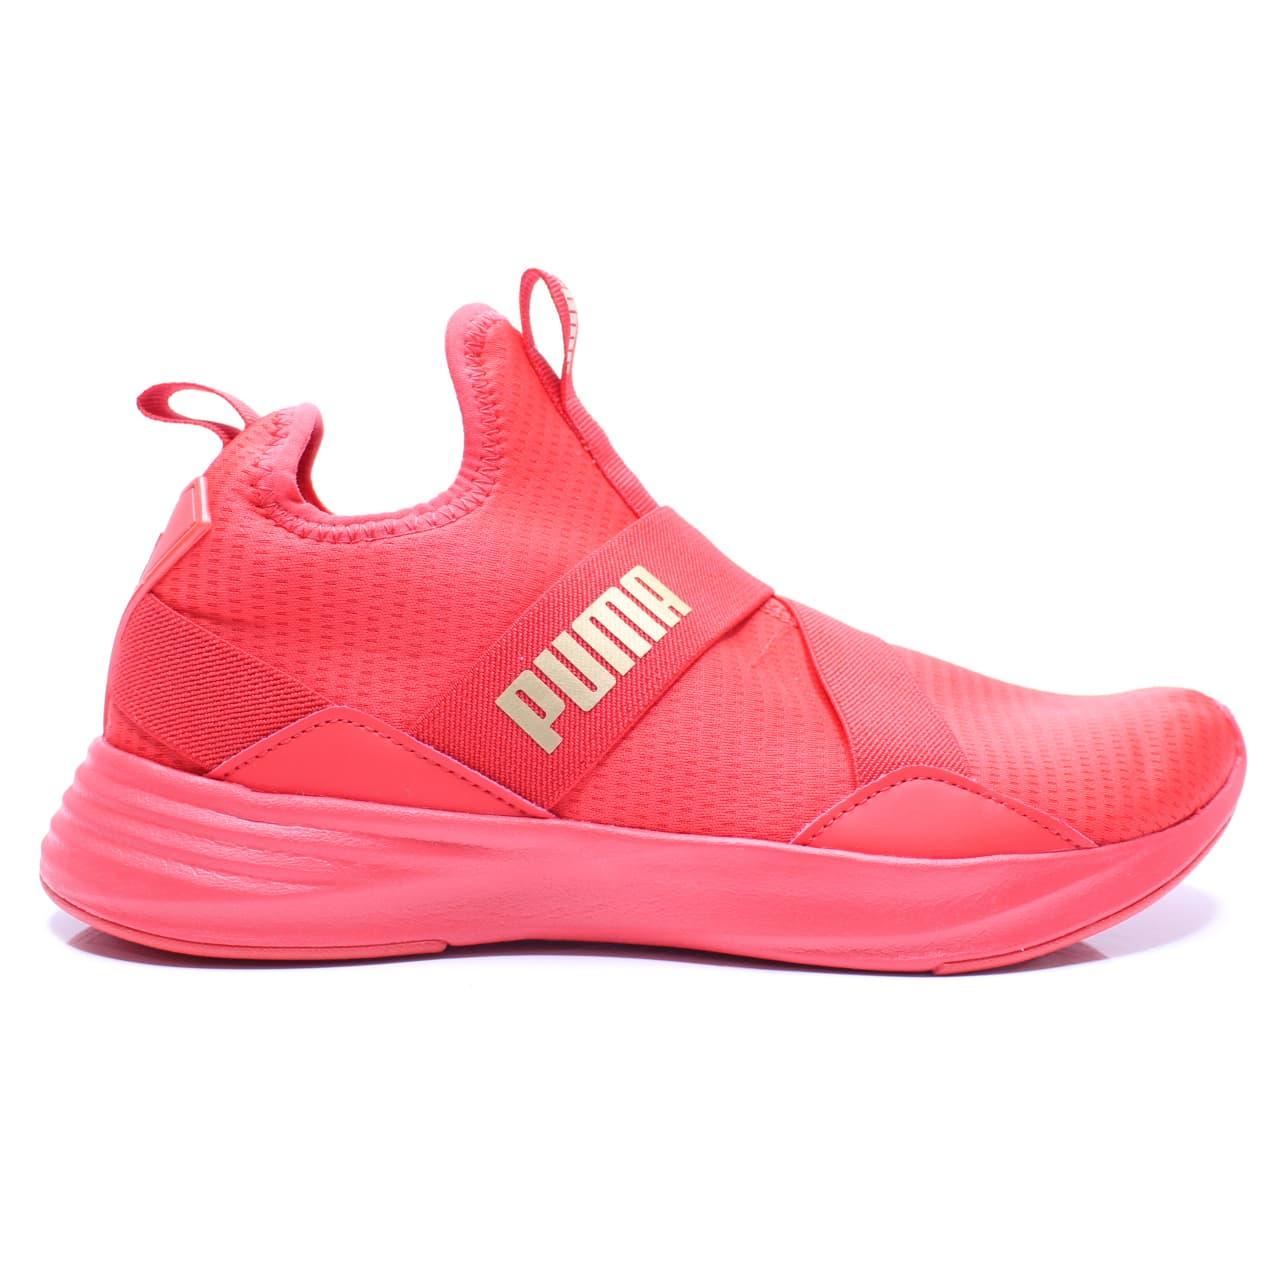 Mix Brands Women's and Men's Sneakers Lot | Wholesale55